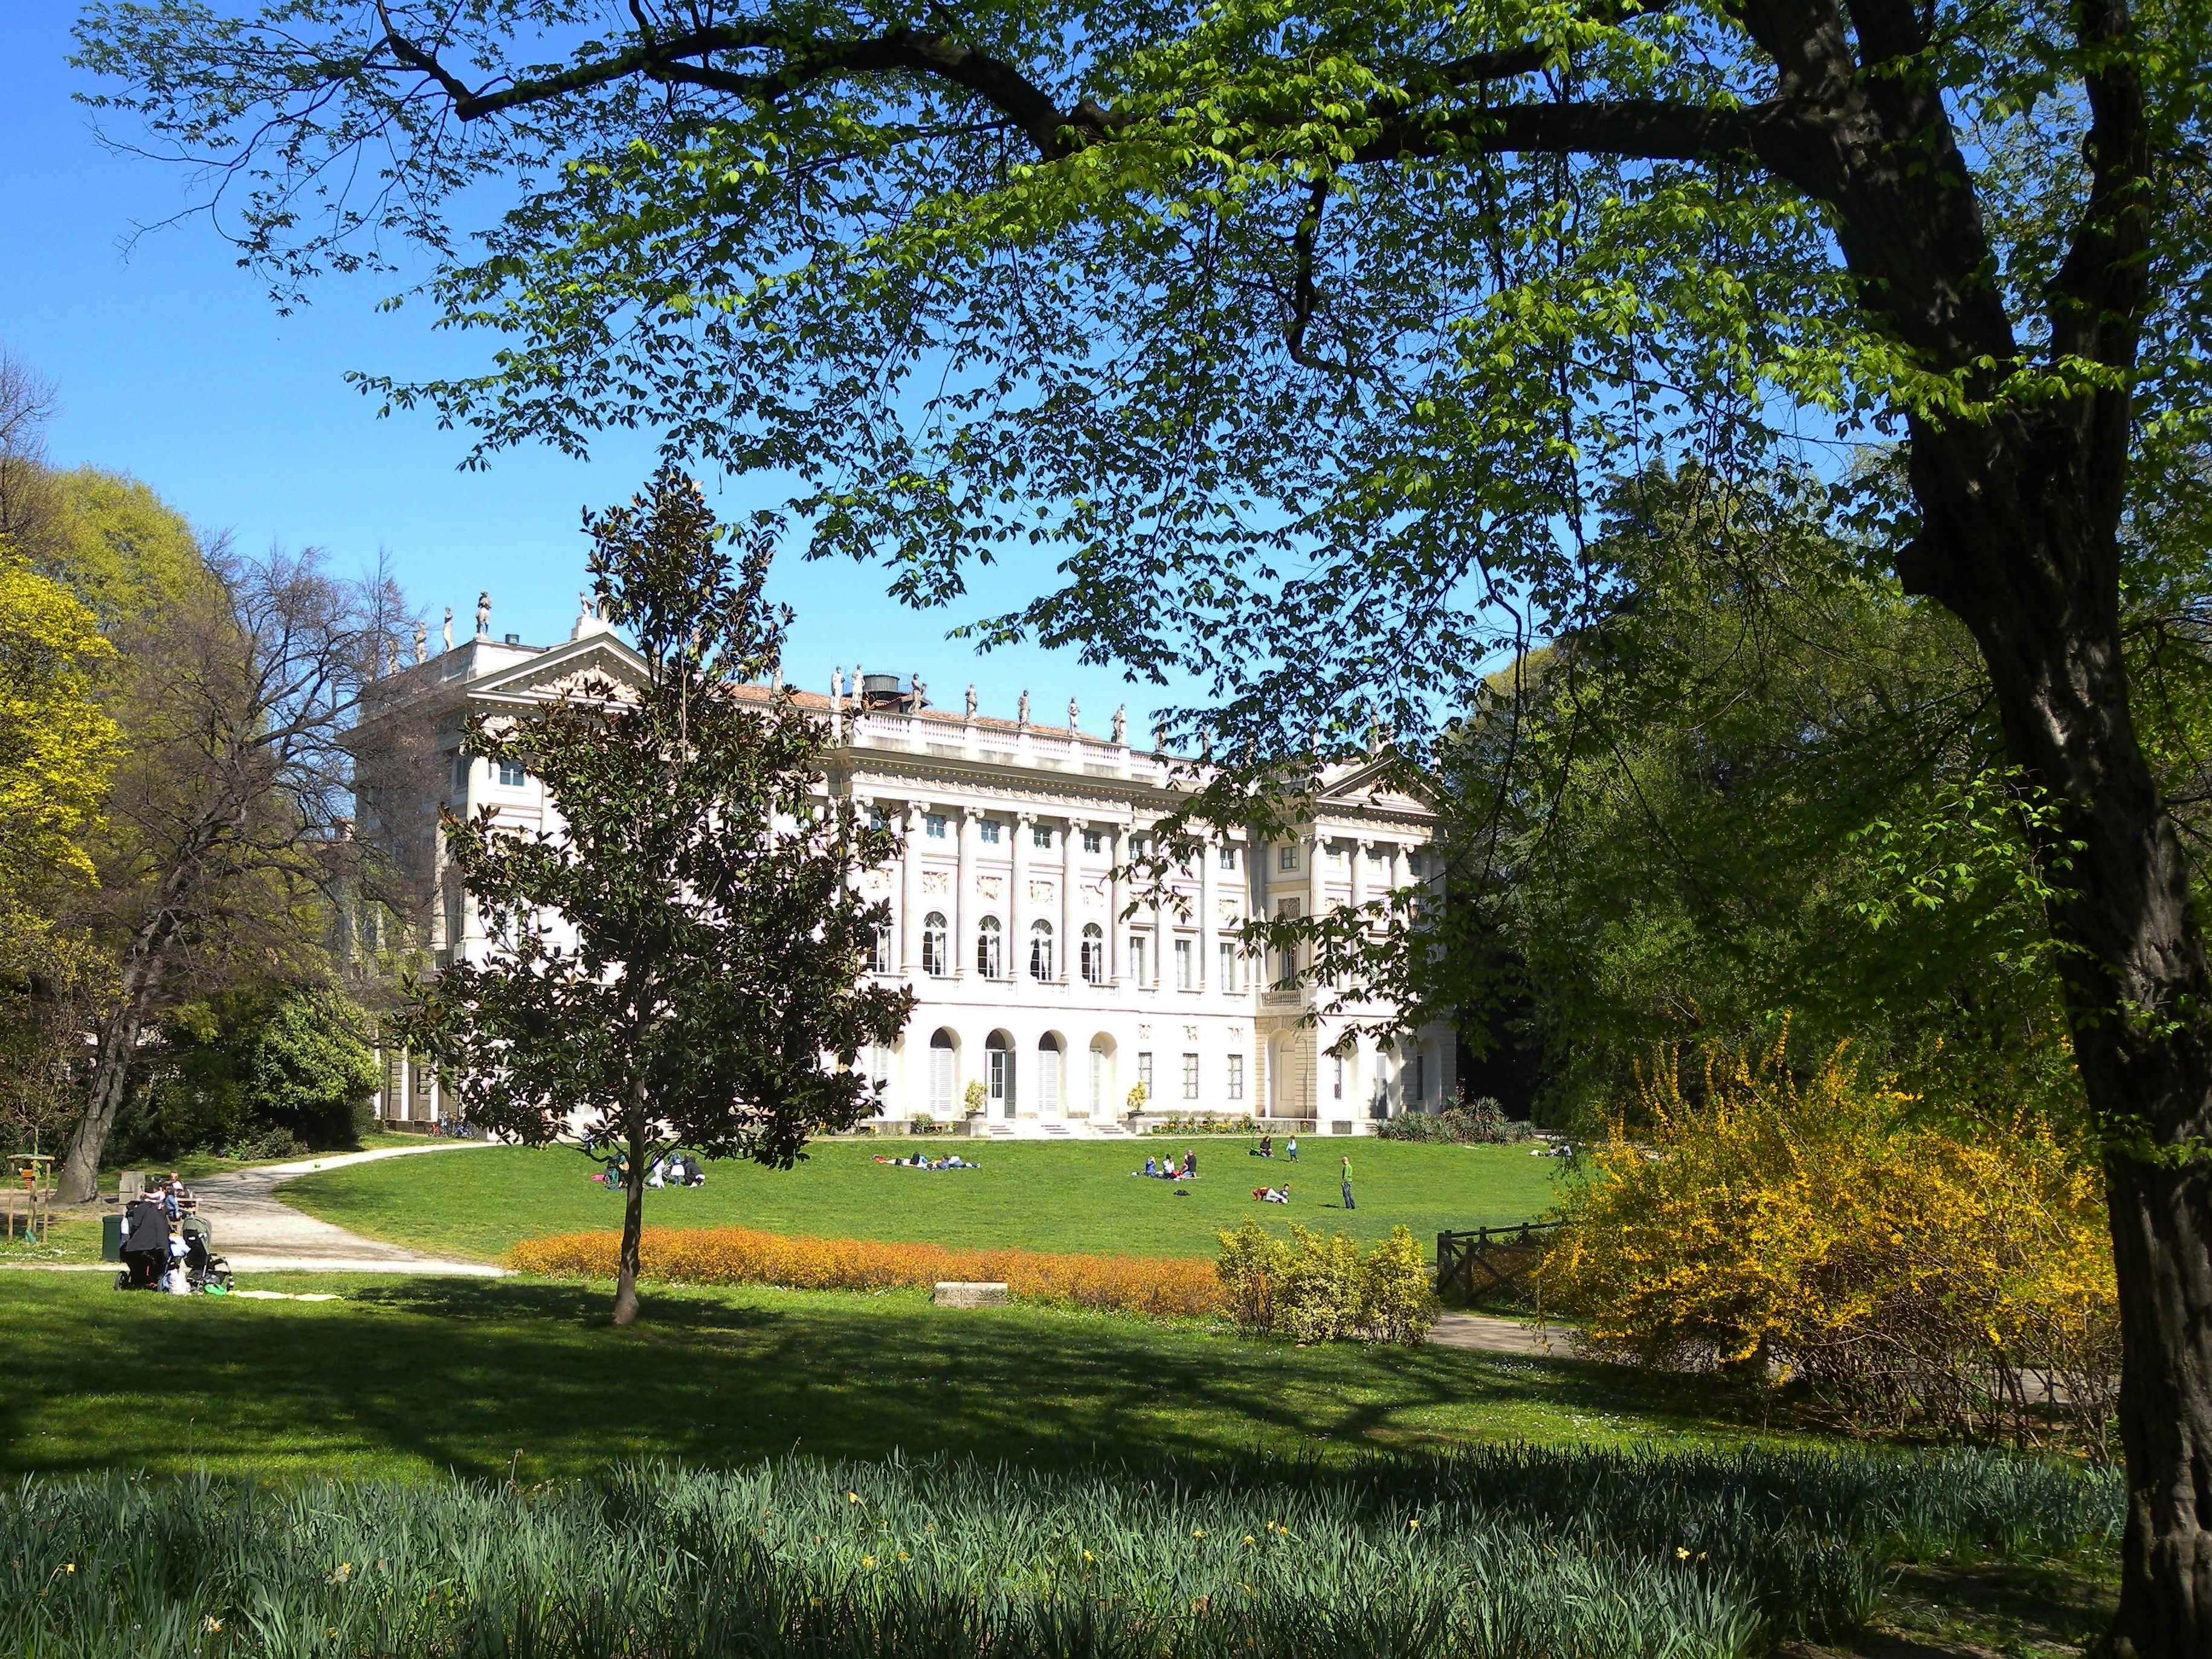 Gam Villa Reale